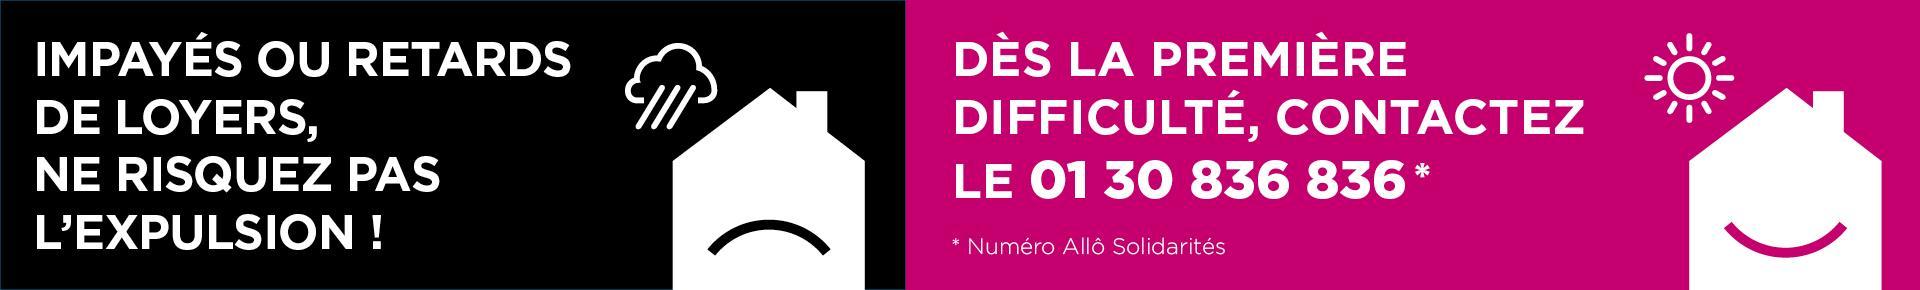 http://www.mairie-grandchamp78.fr/medias/images/banniere-loyers-impayes-1.jpg